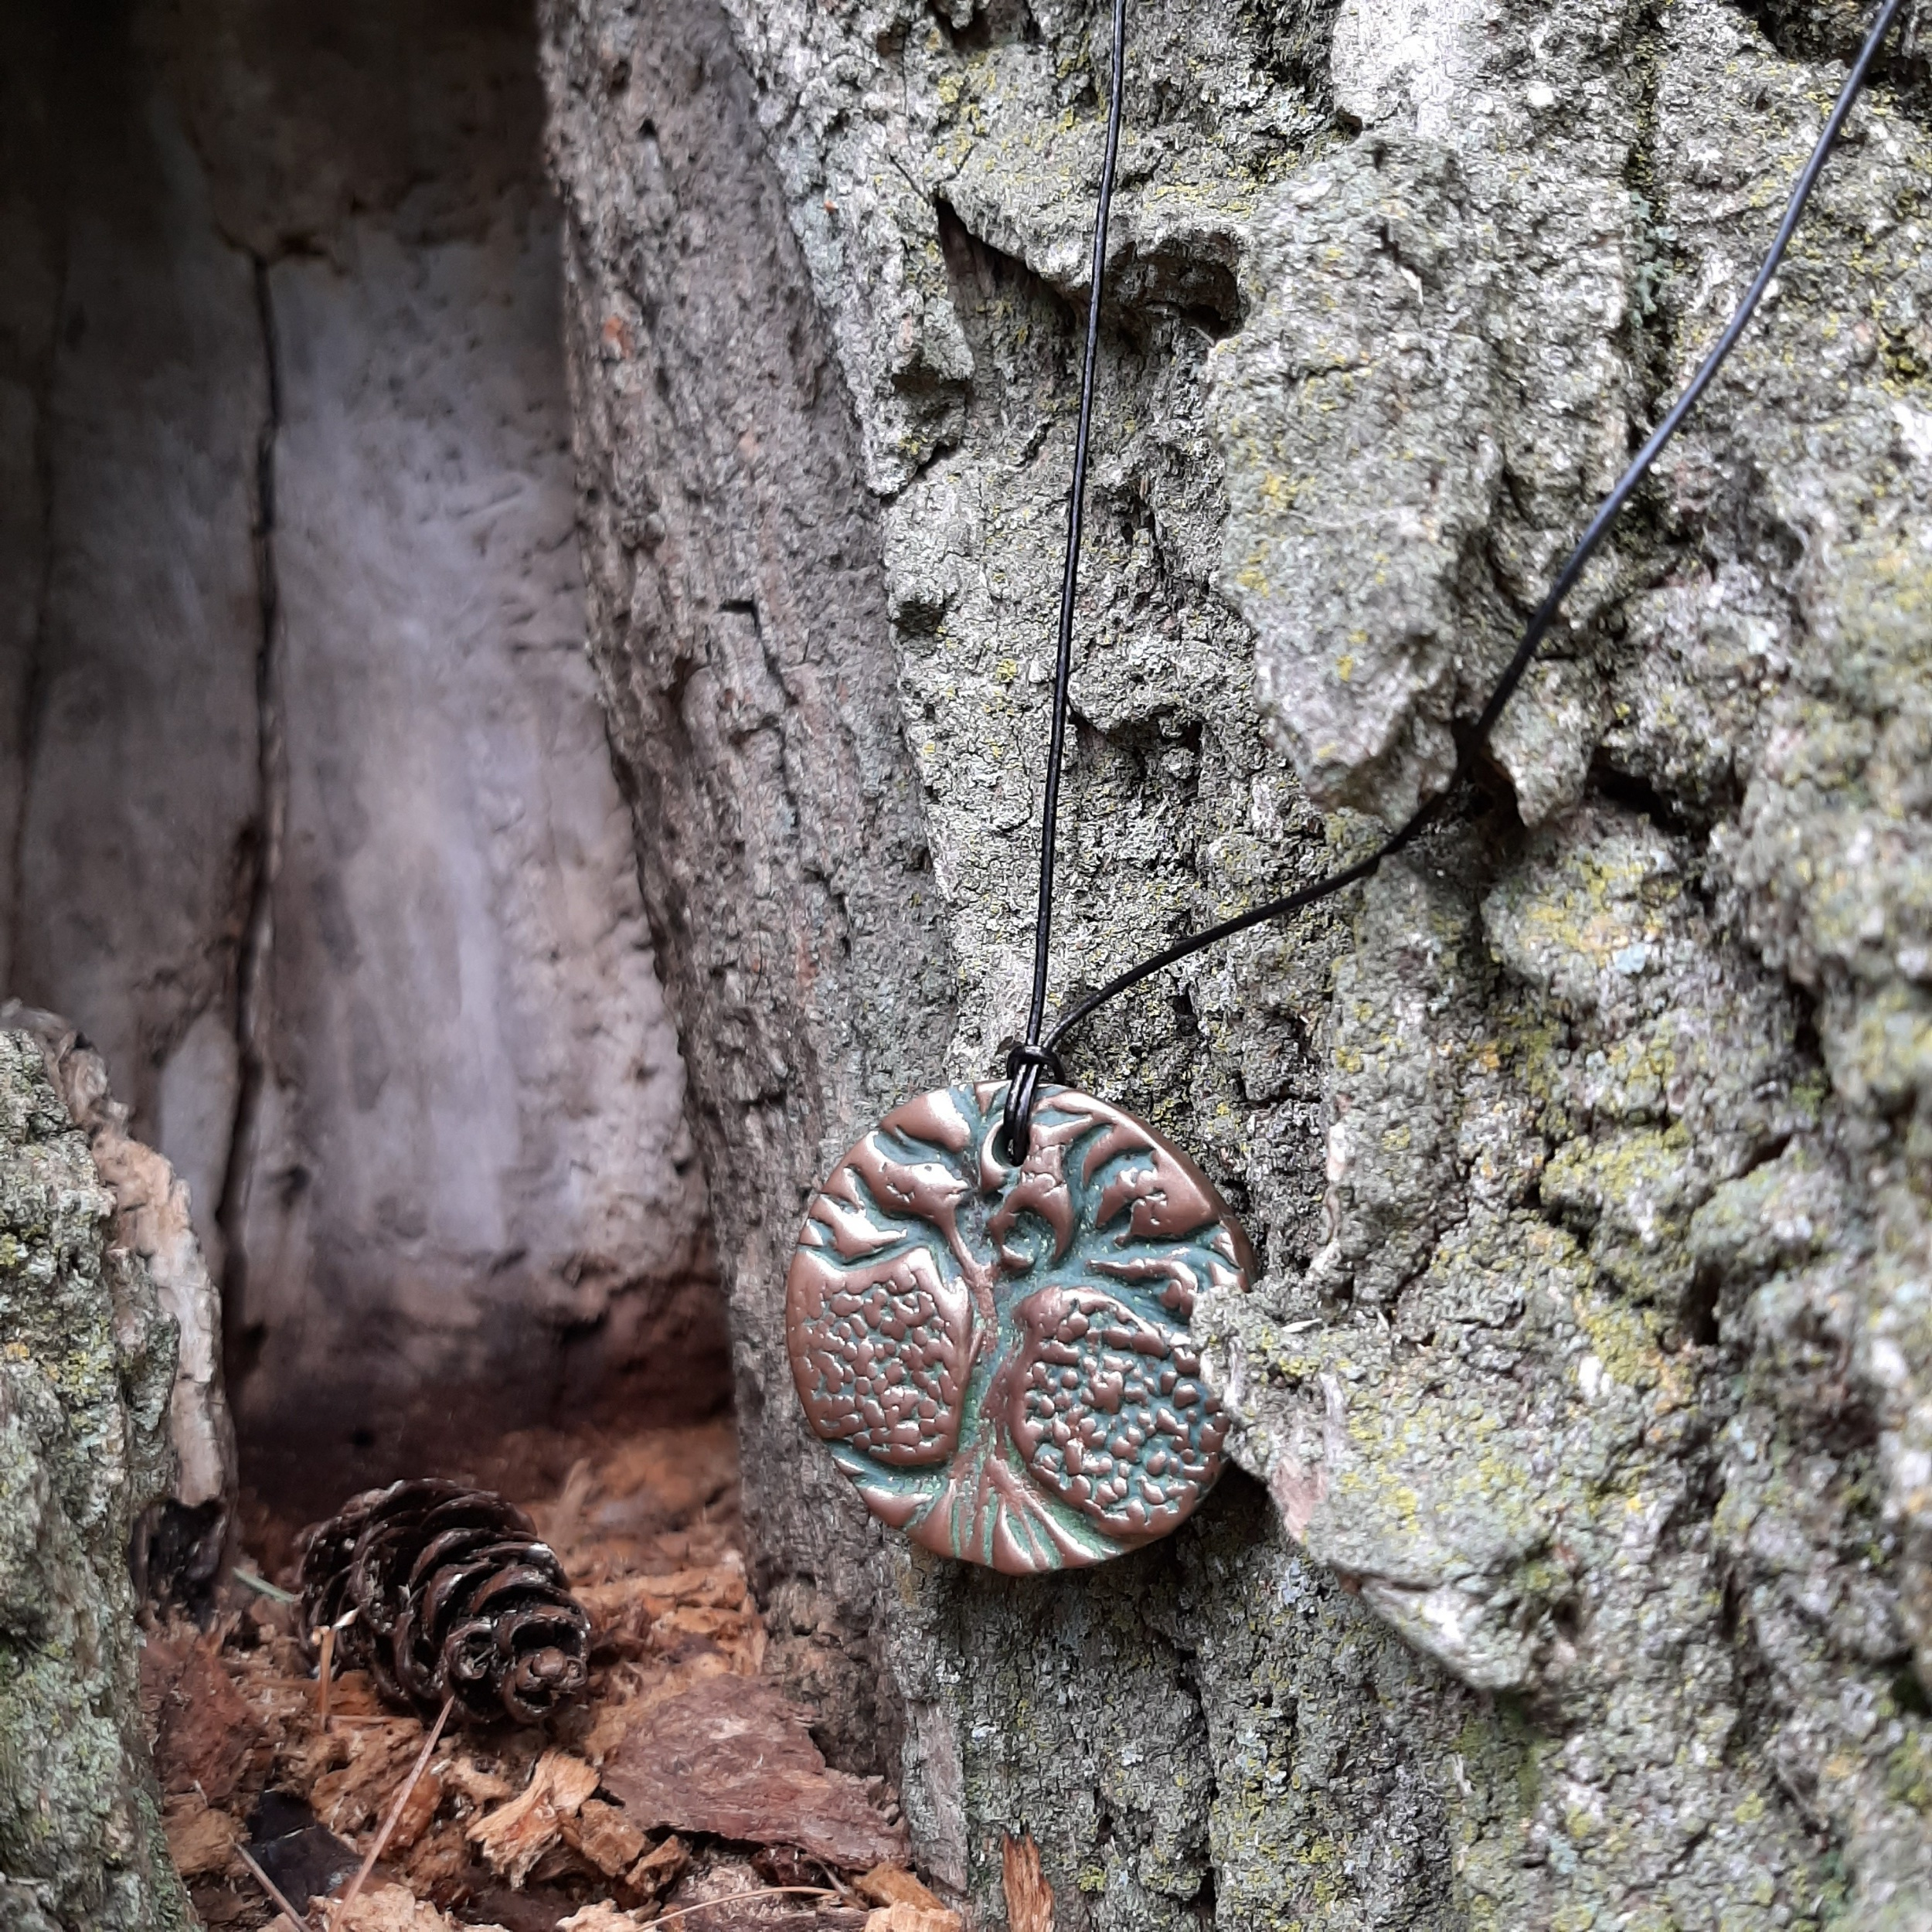 Dryad impression, Southport Park, Kenosha  Status unknown